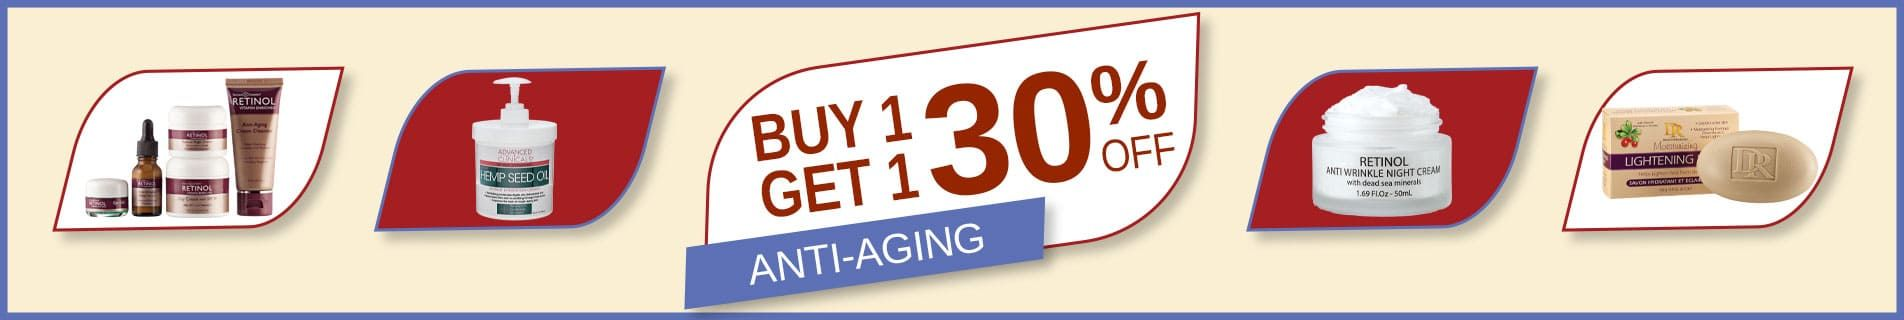 Buy 1 Get 1 30% Off Anti-Aging